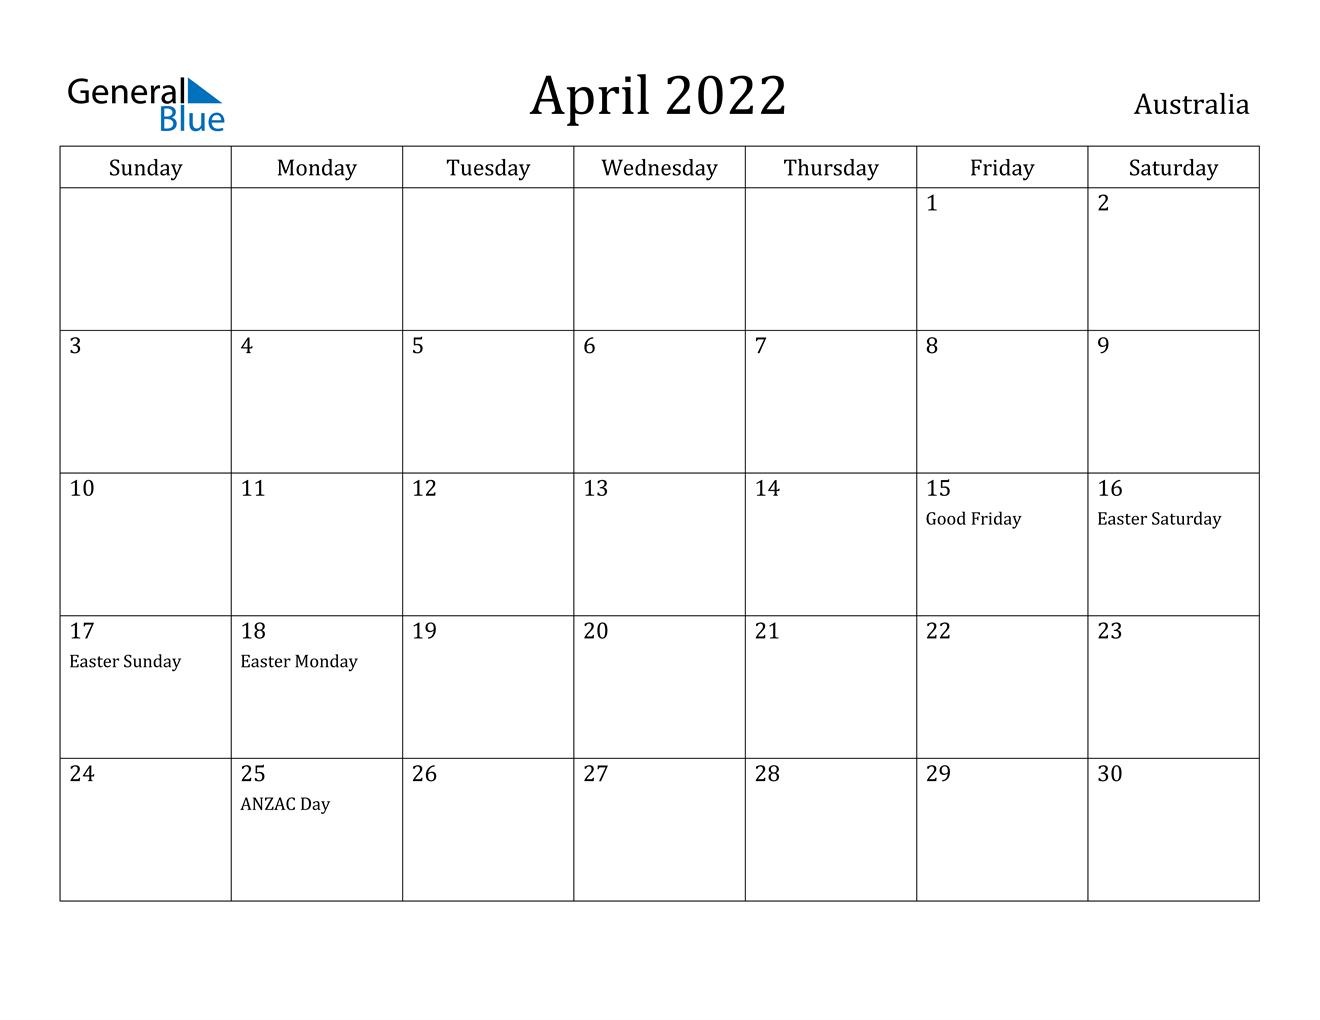 April 2022 Calendar - Australia